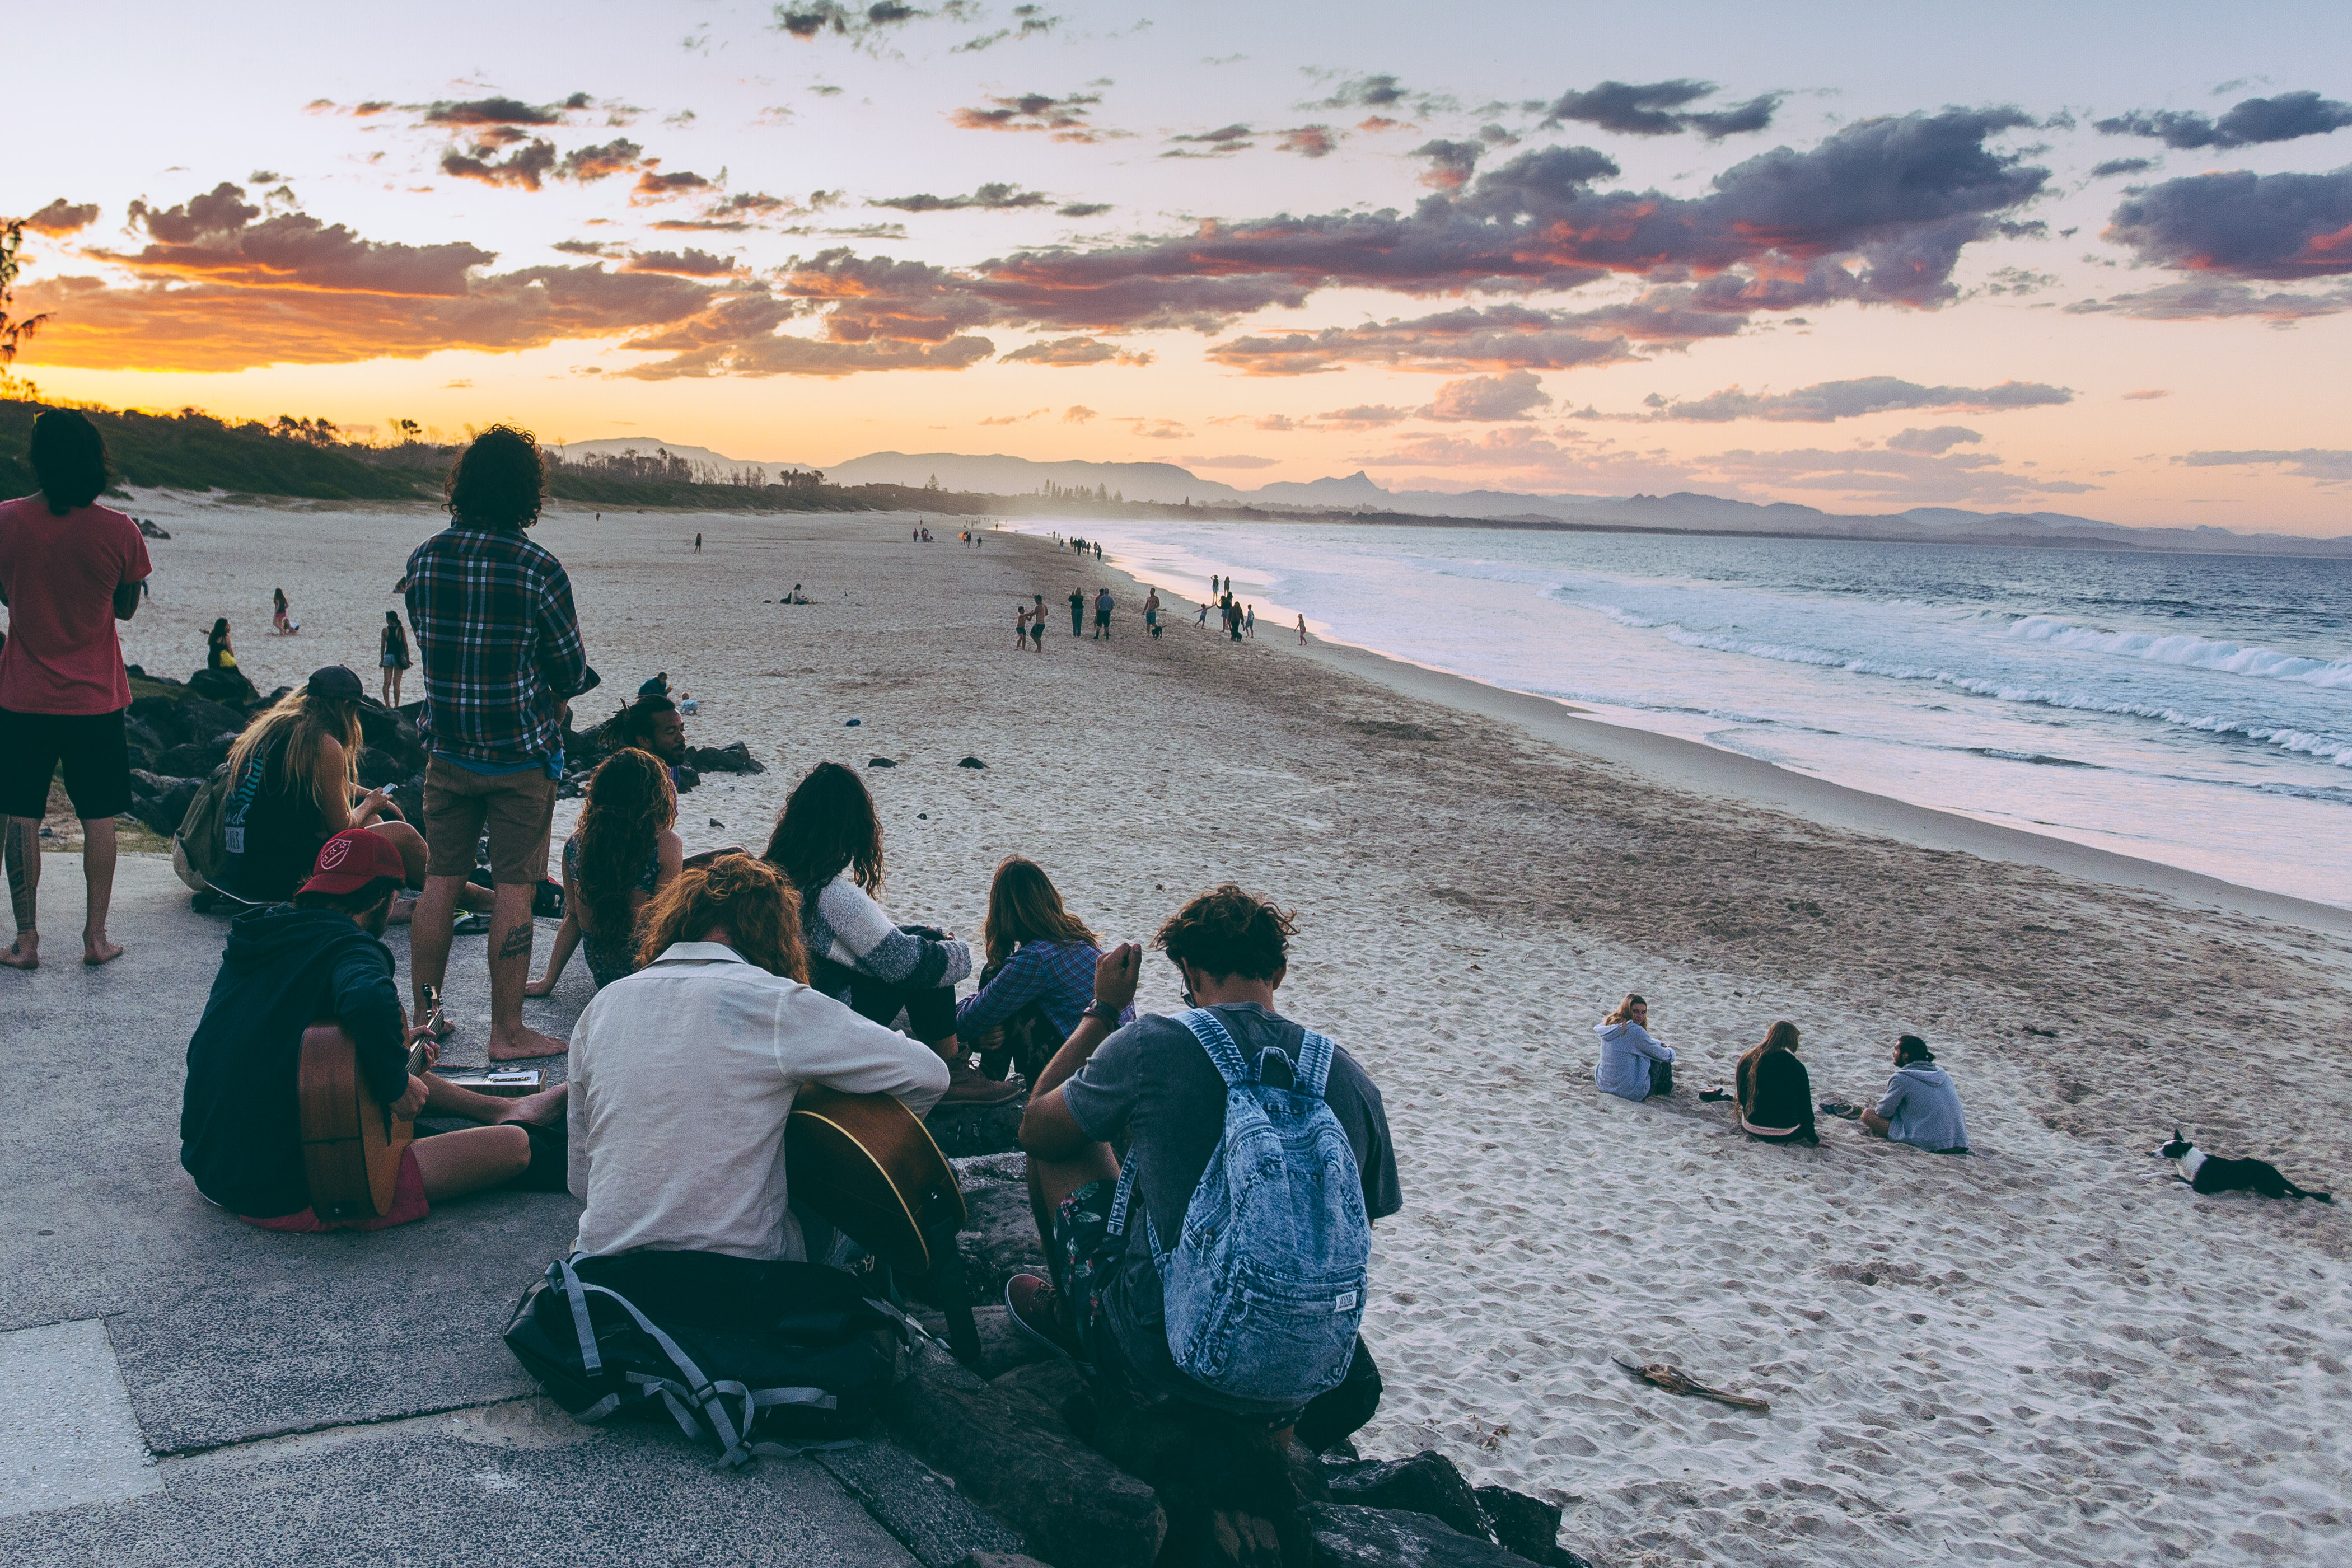 east coast australia travel guide